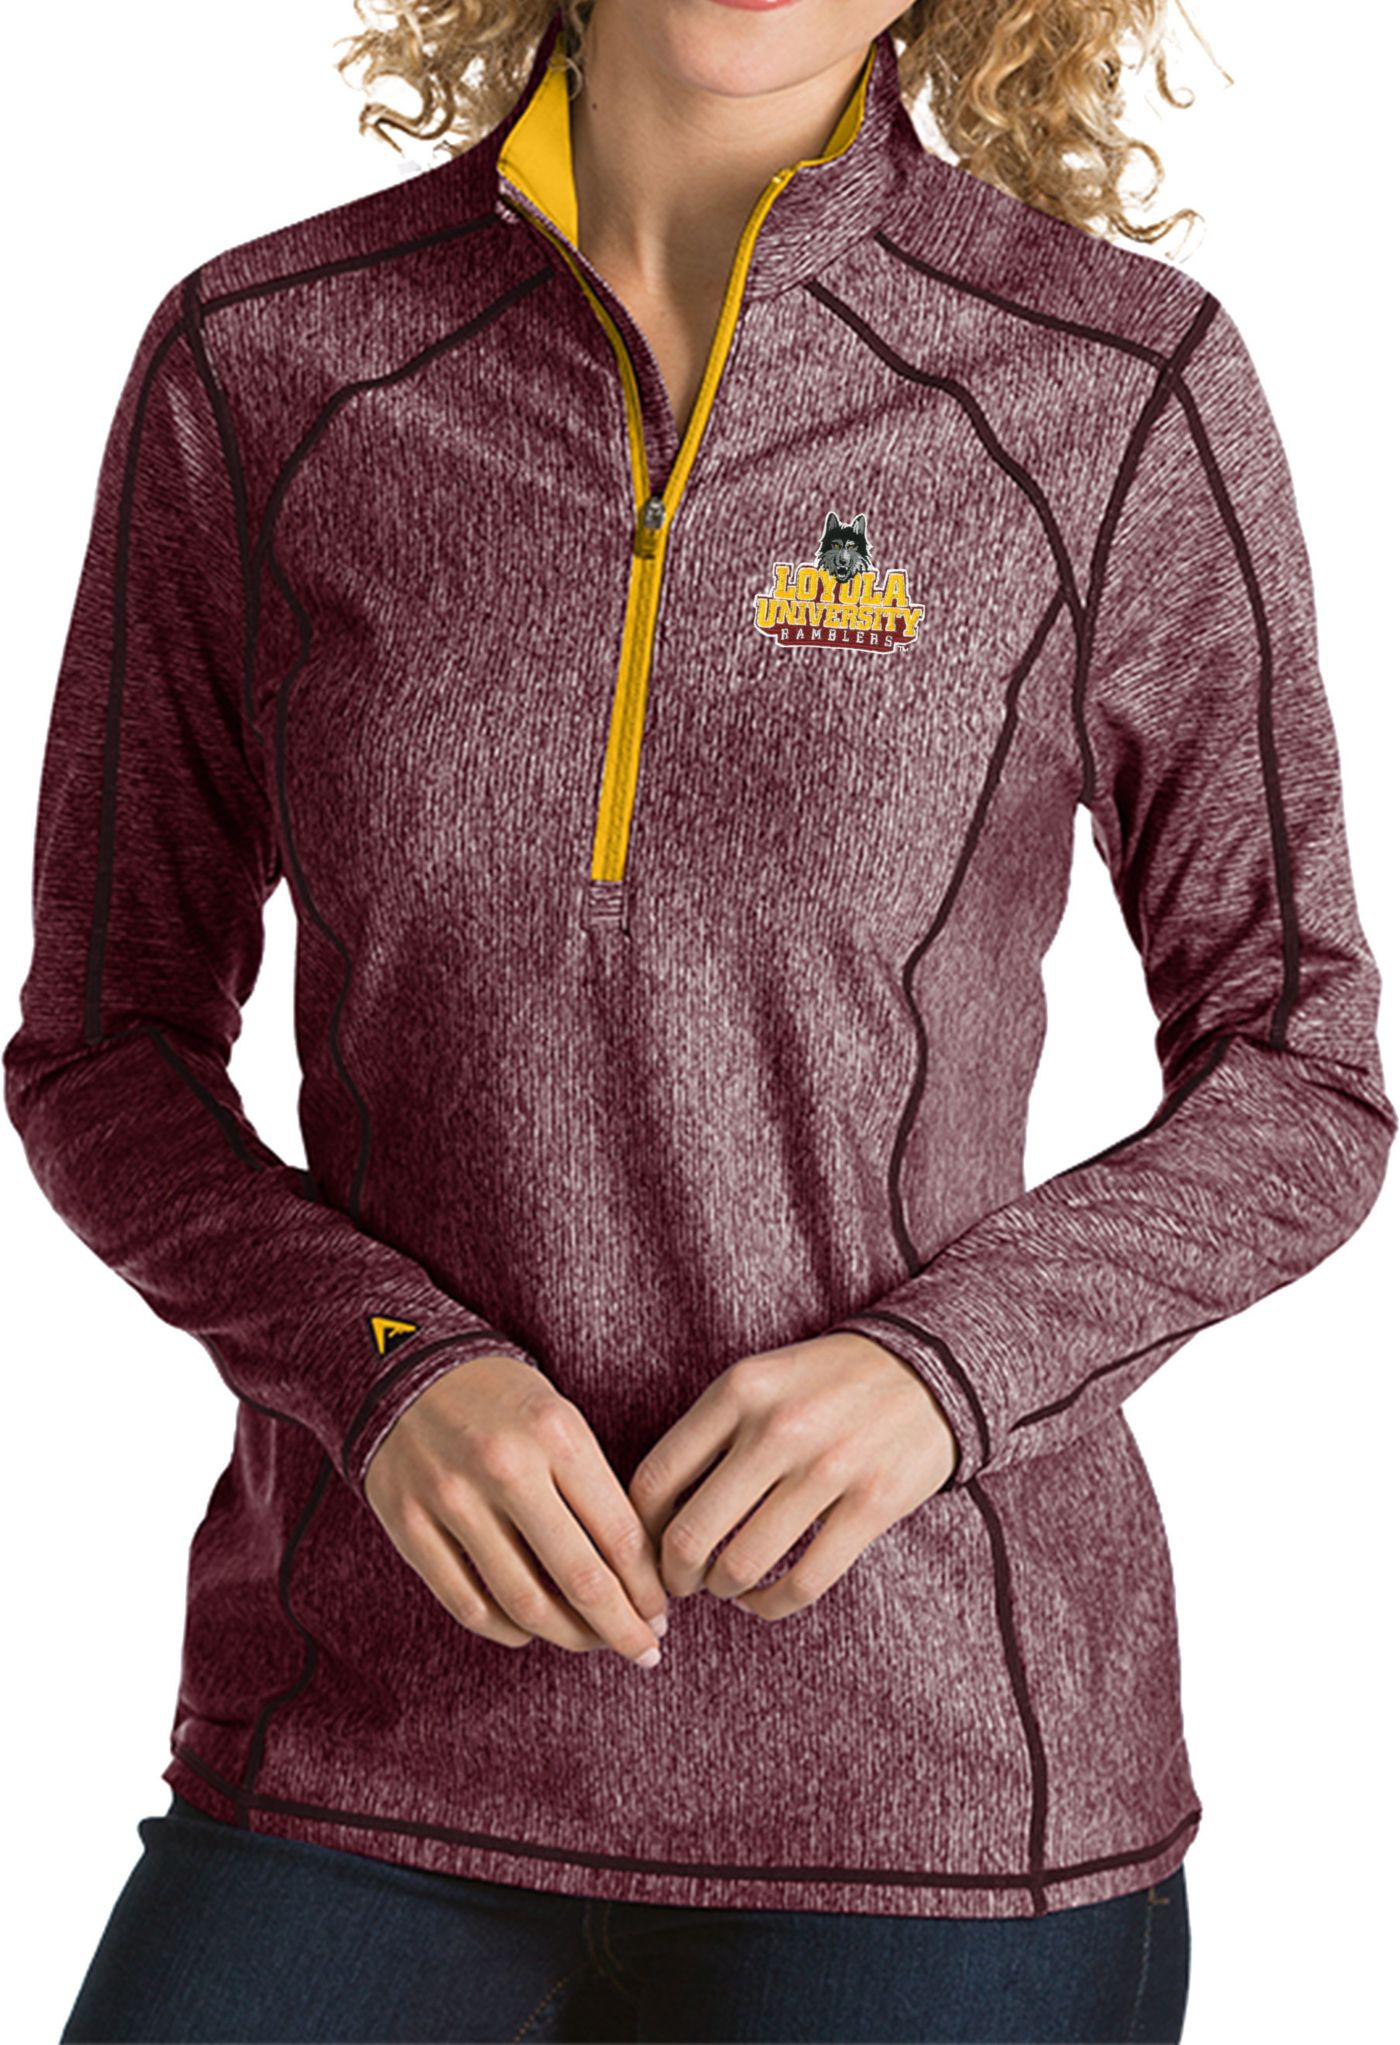 Antigua Women's Loyola Chicago Ramblers Maroon/Gold Tempo Half-Zip Pullover